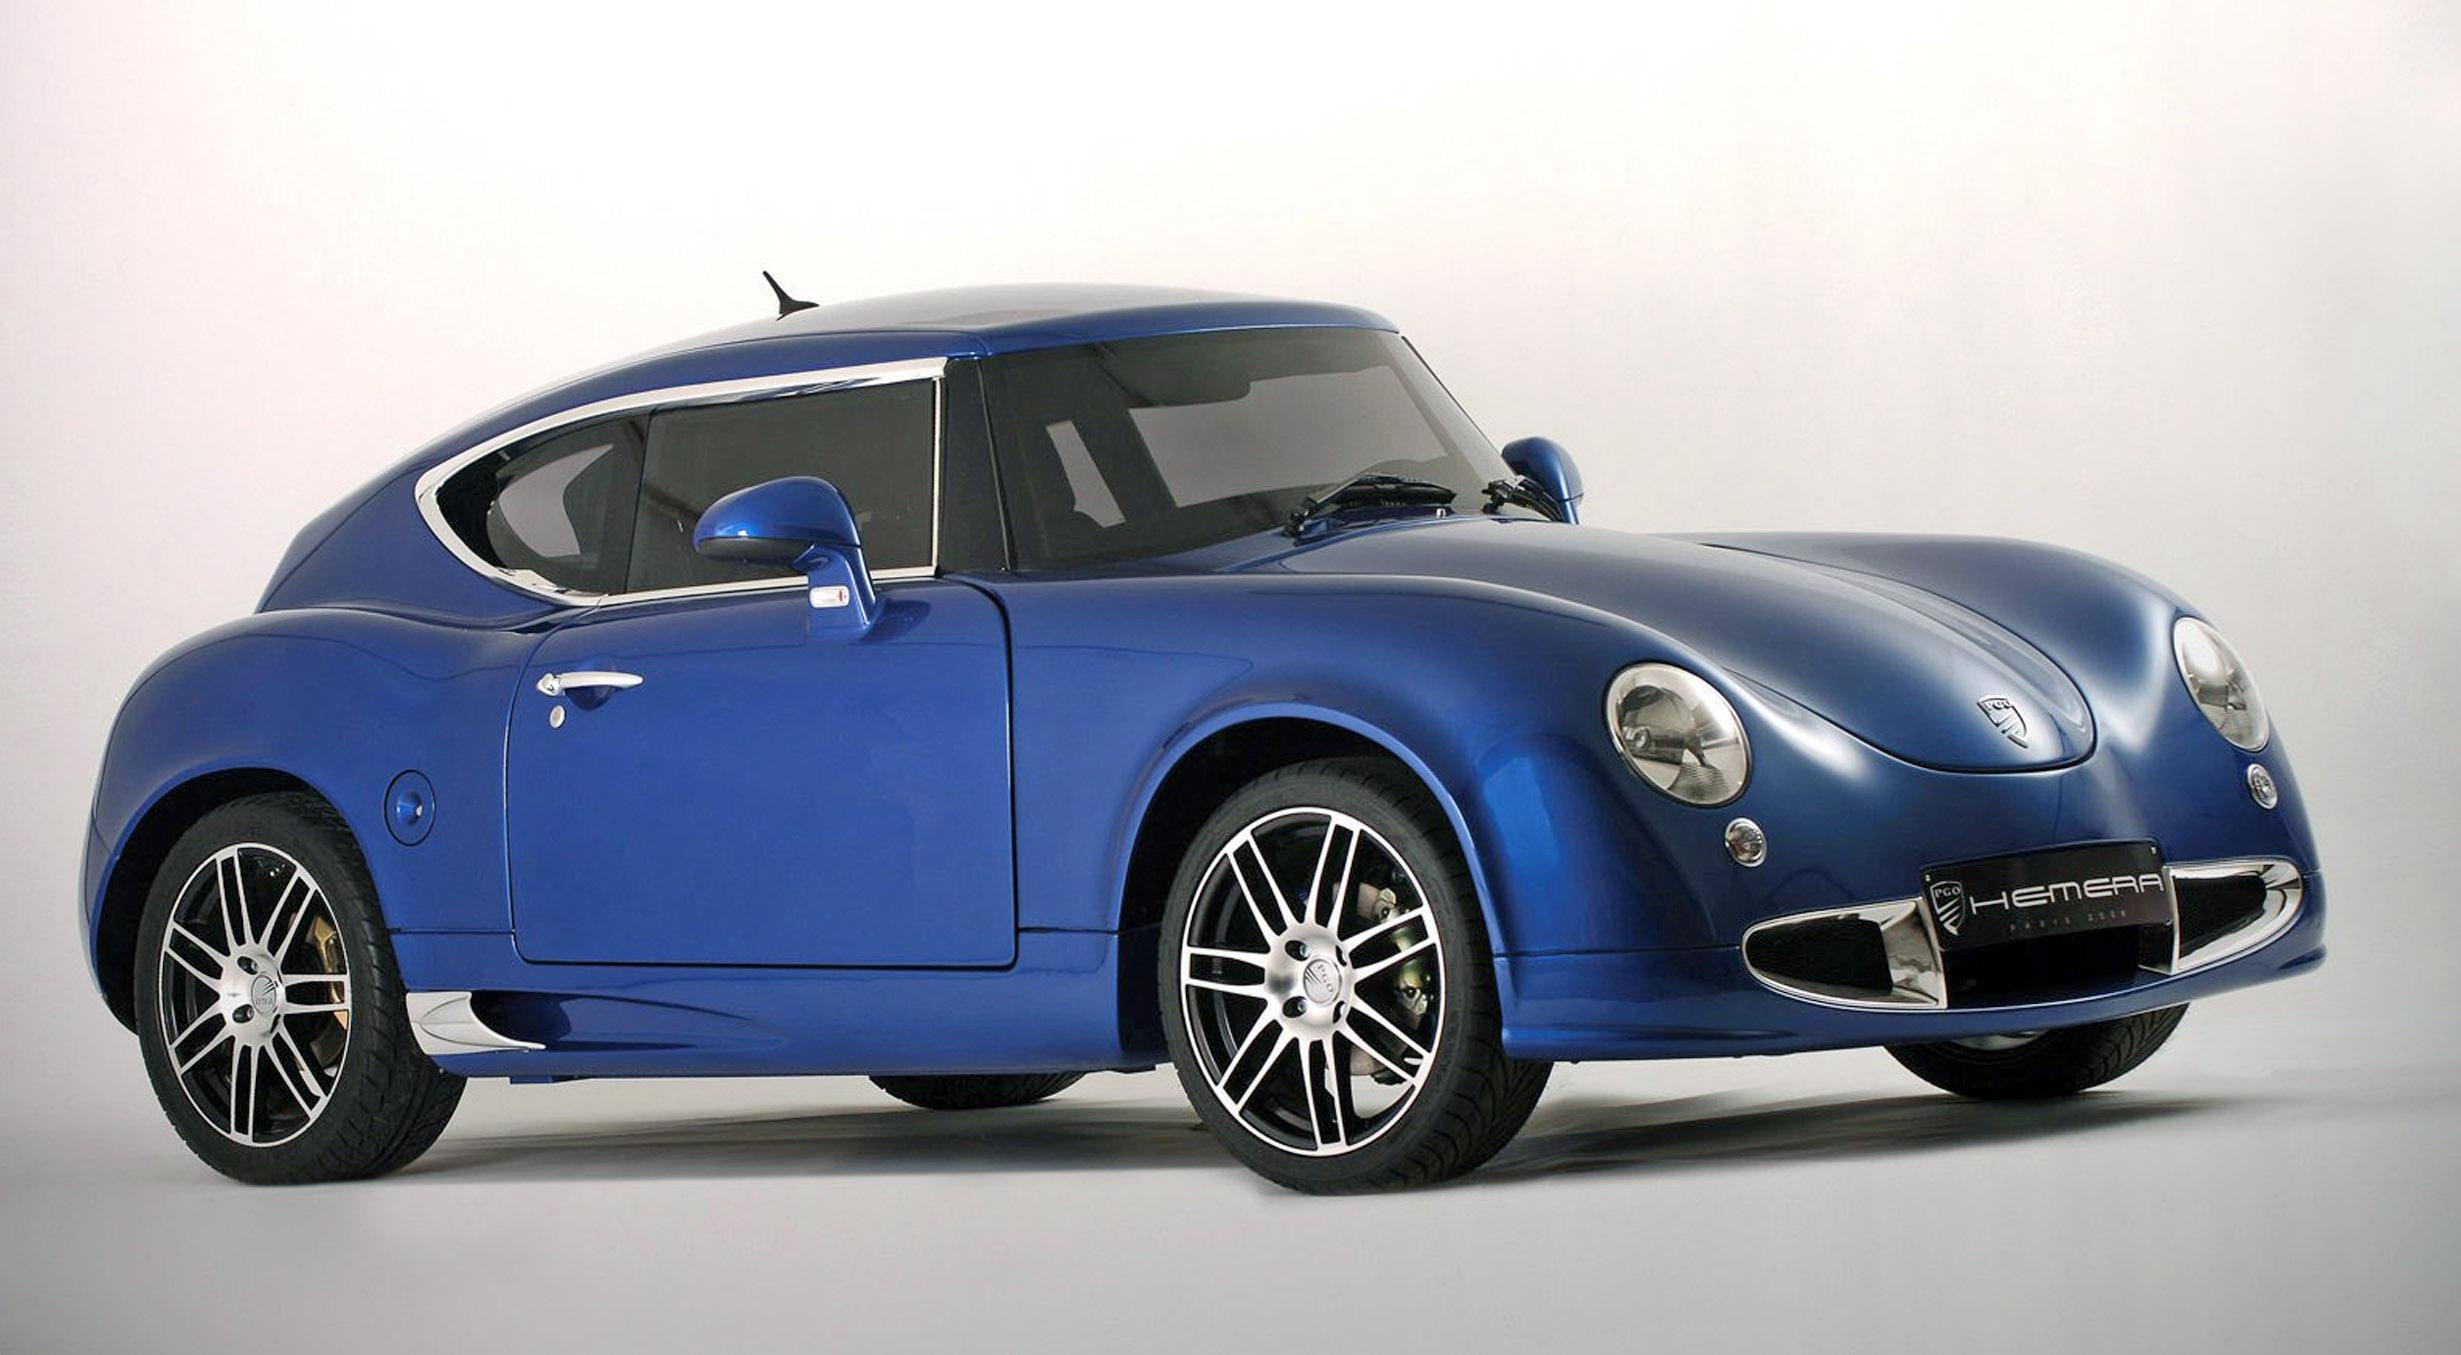 production automobile en france marque par marque pgo. Black Bedroom Furniture Sets. Home Design Ideas